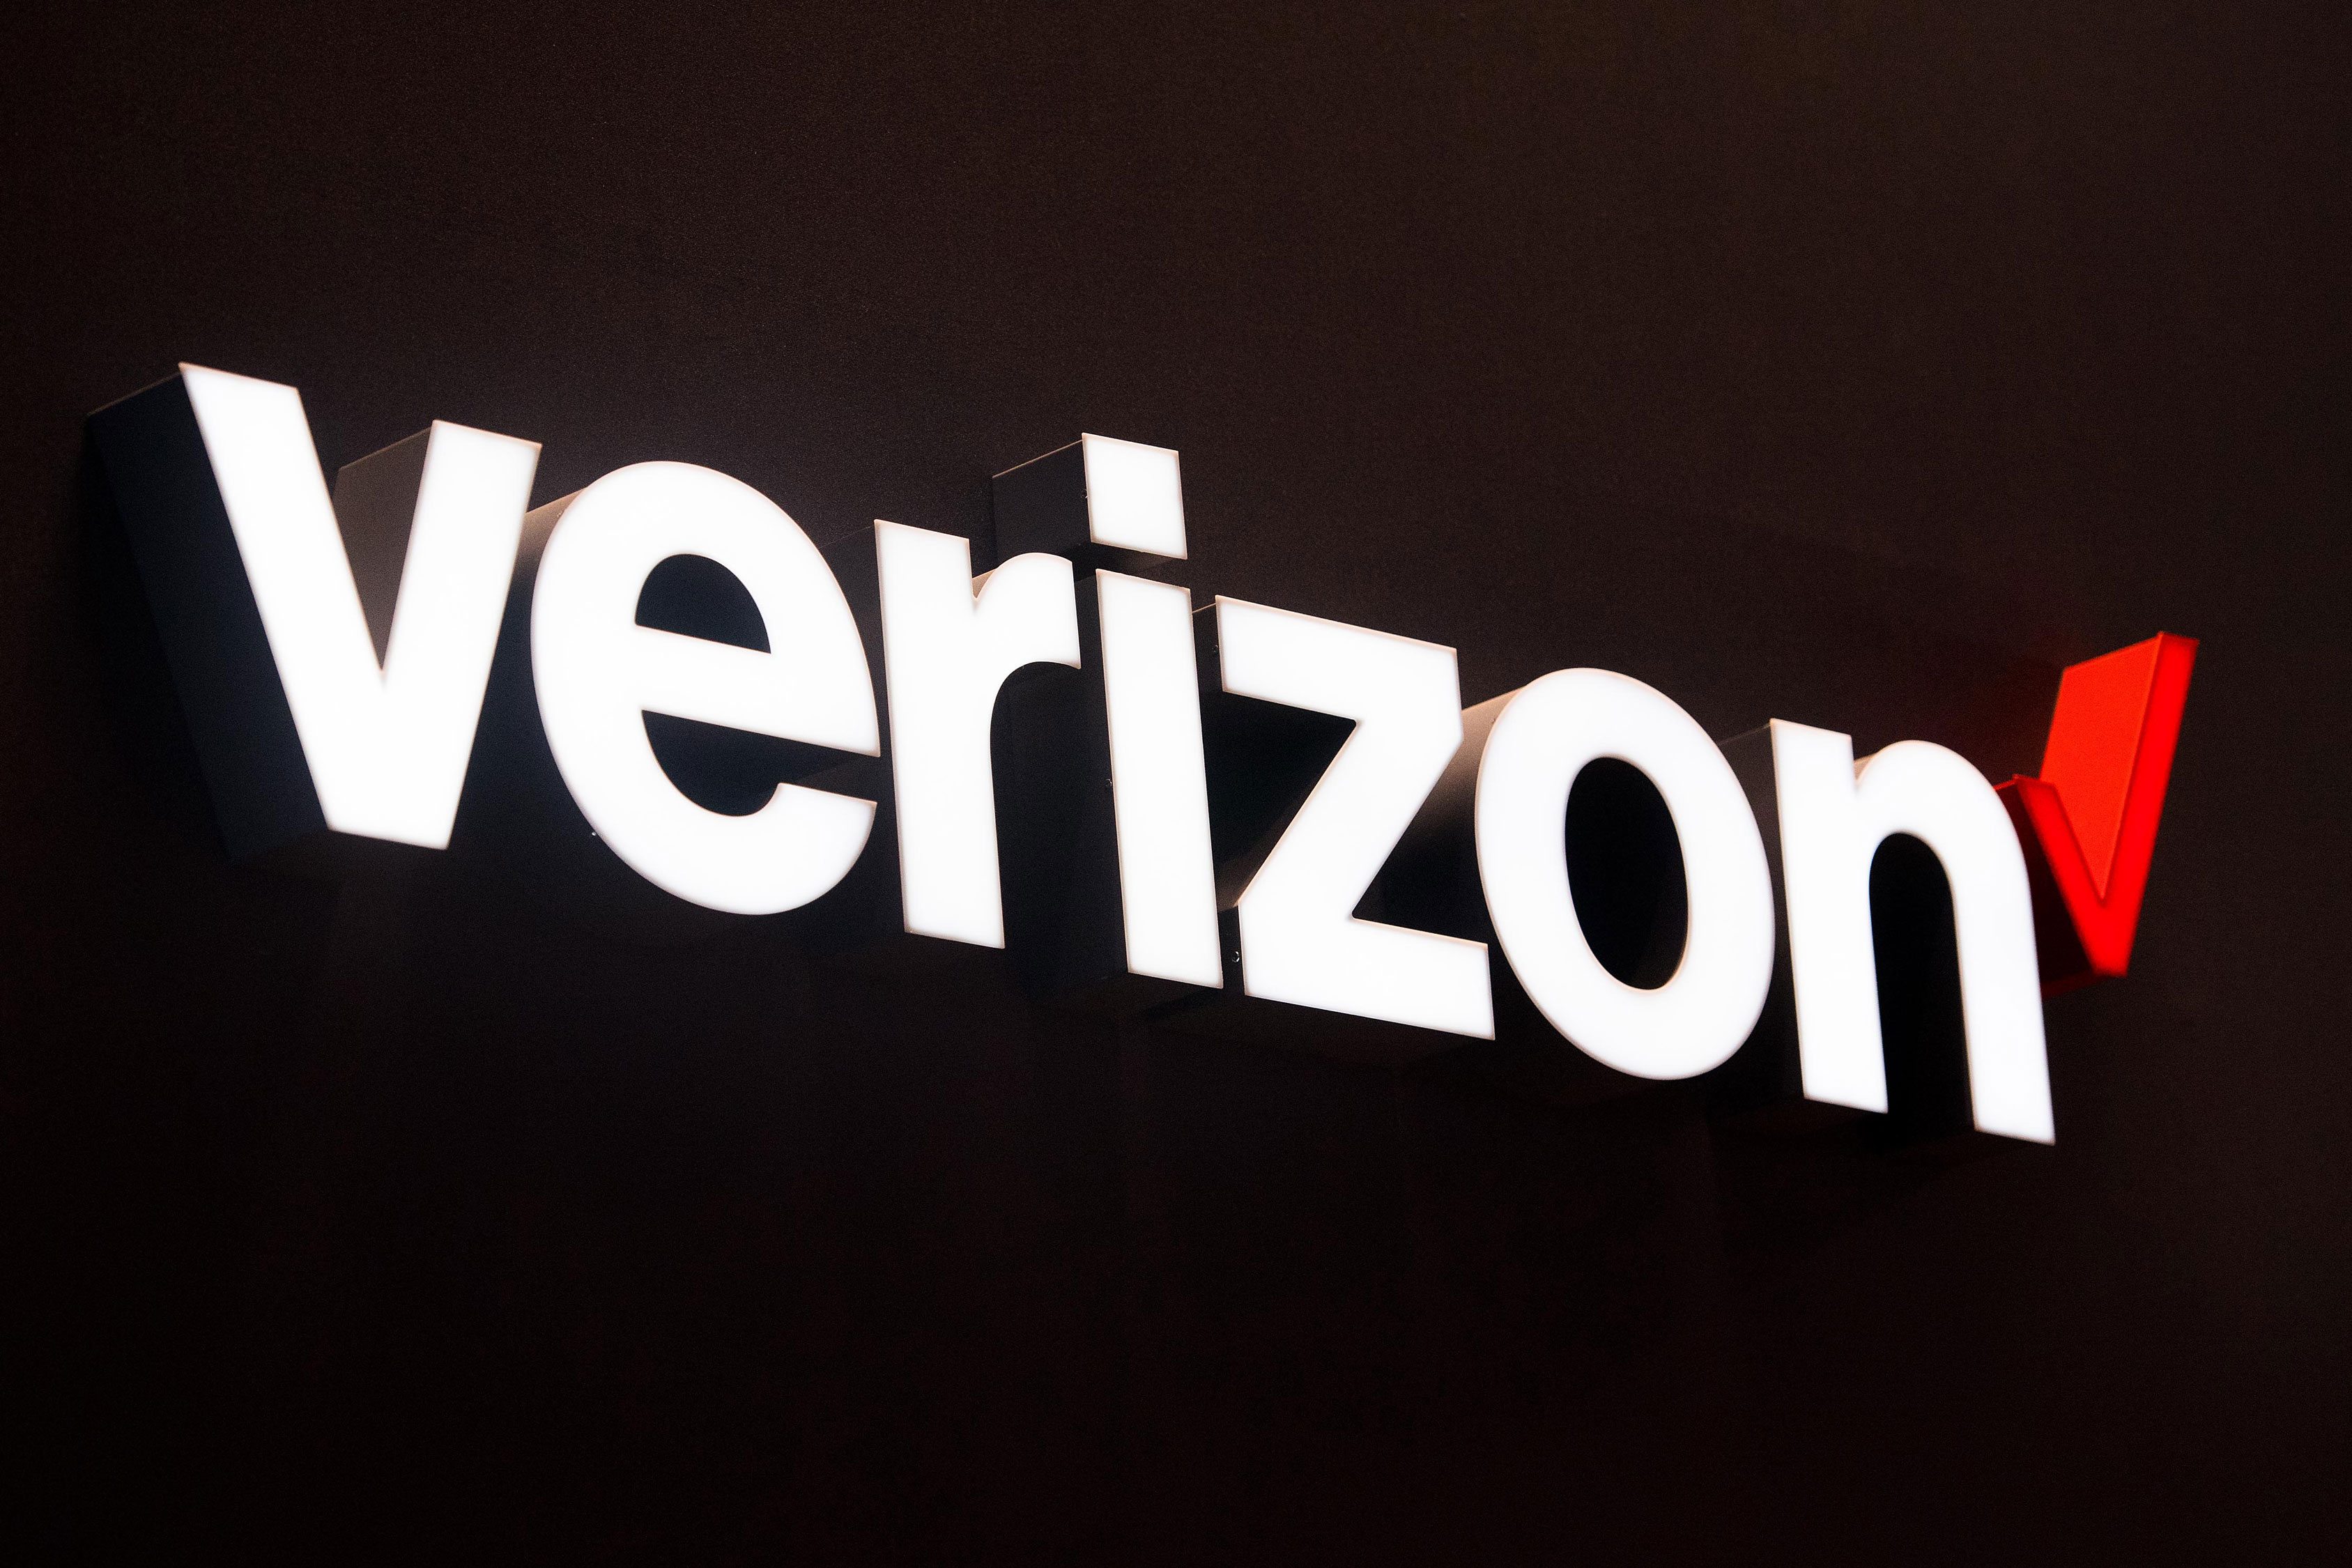 Source: Verizon to sharpen content strategy with OTT video service, IoT platform